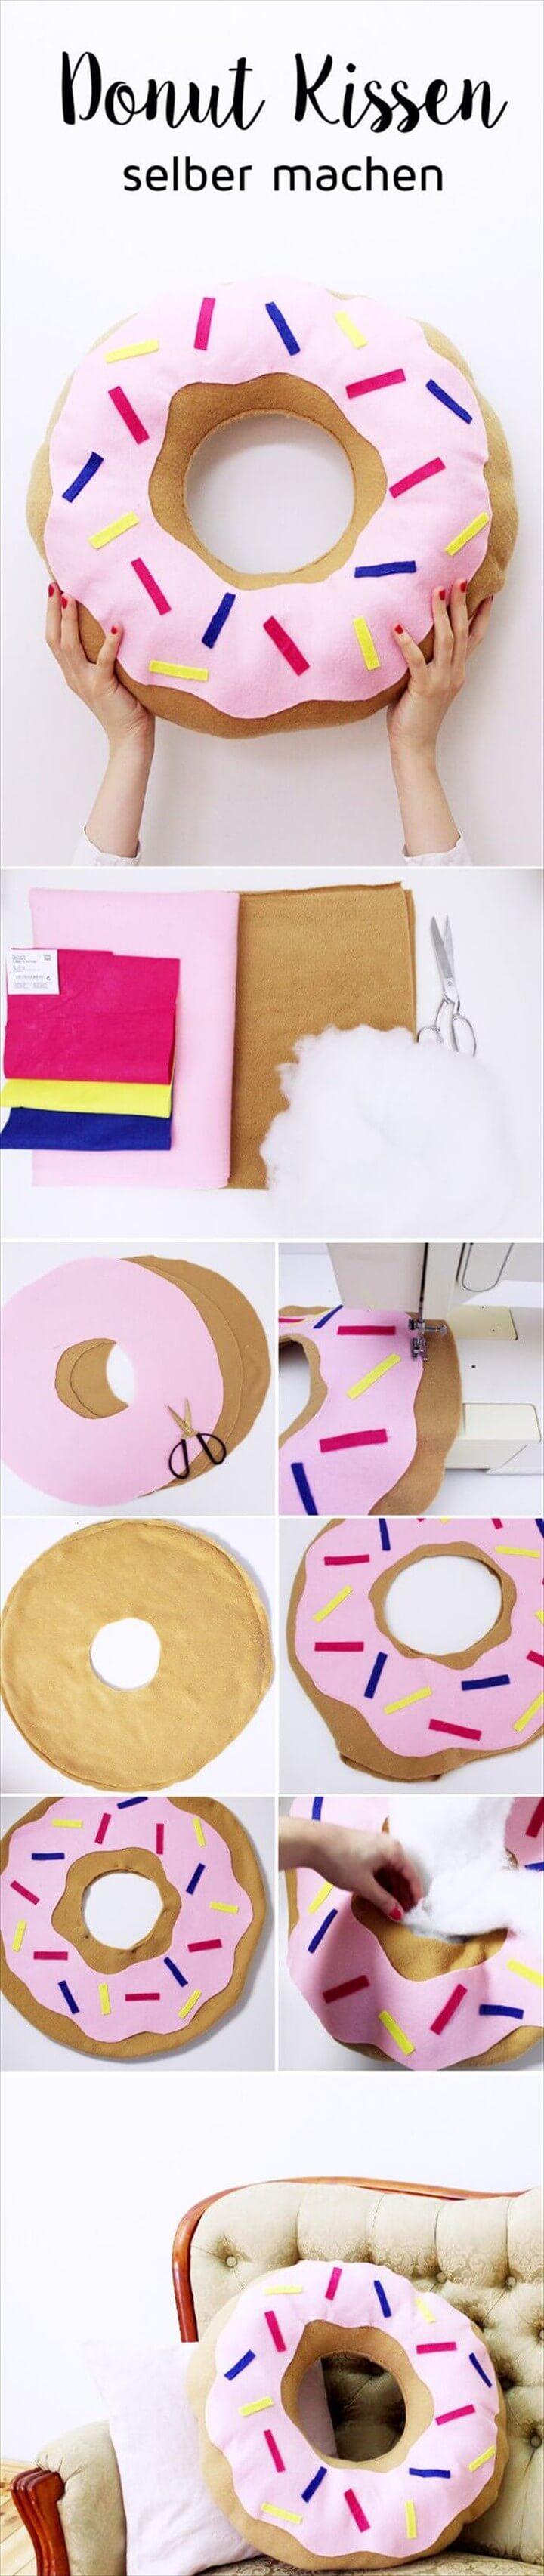 Easy To Make DIY Donut Pillows